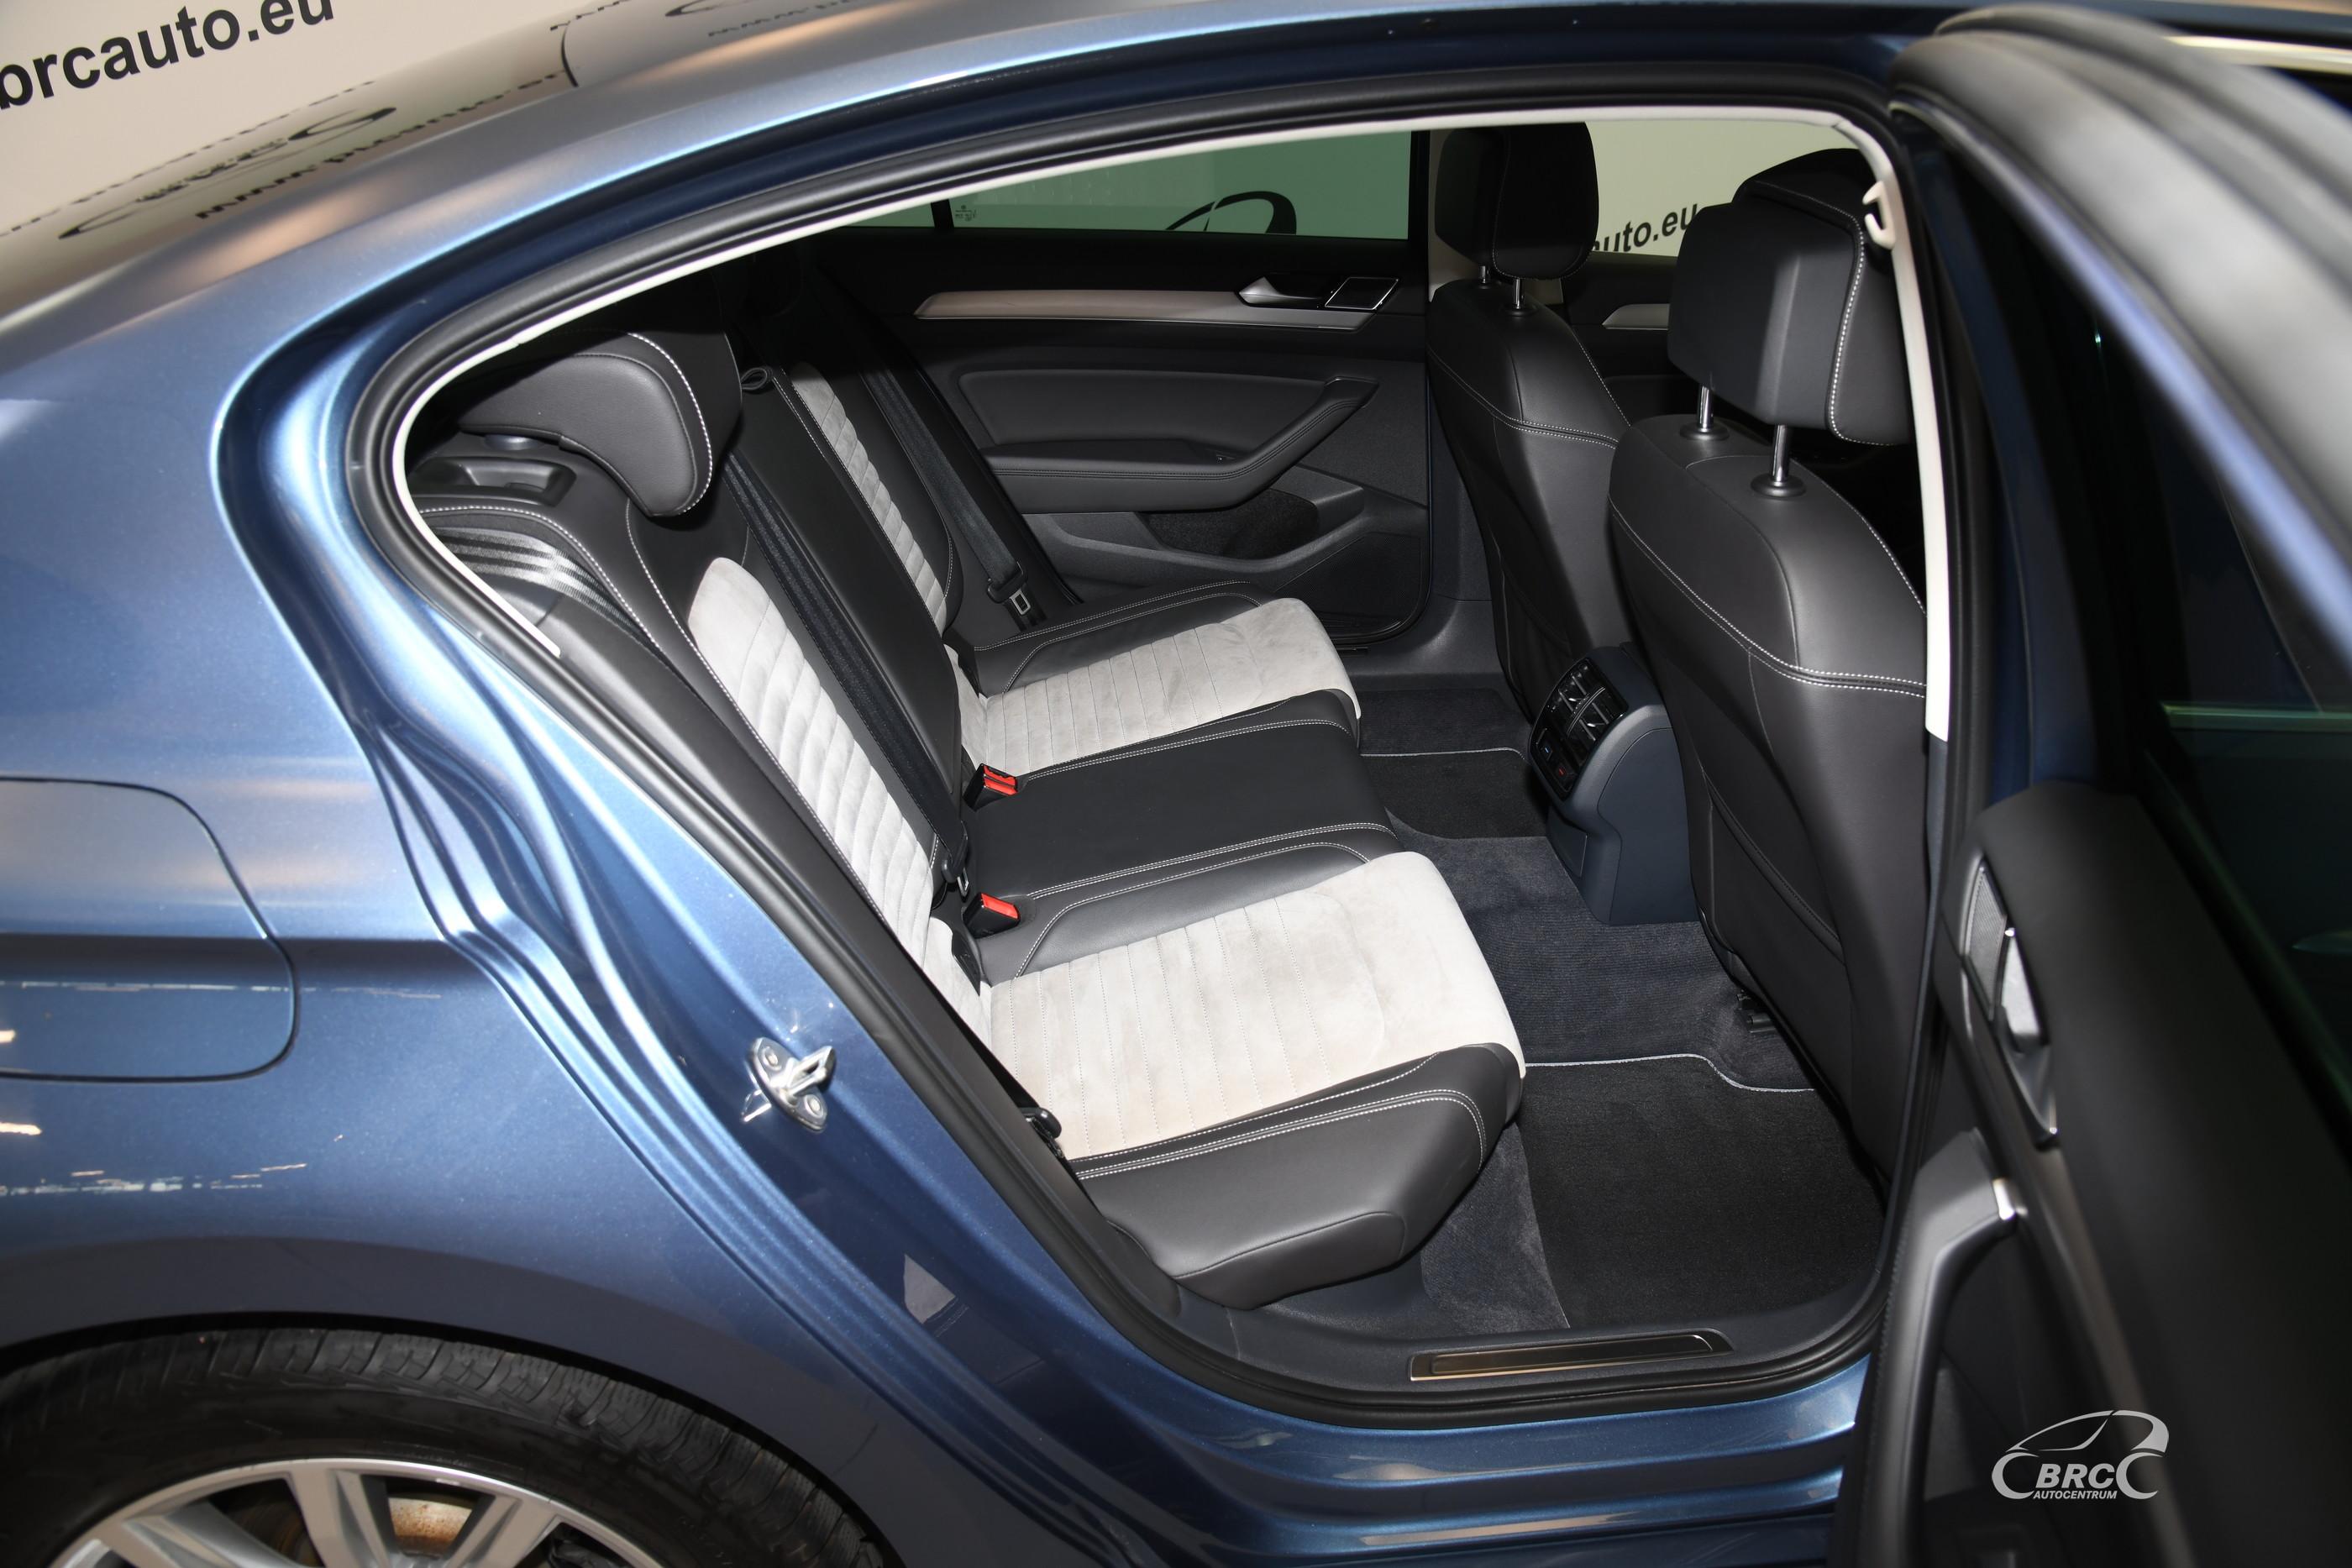 Volkswagen Passat 1.8 TSI Highline DSG Automatas